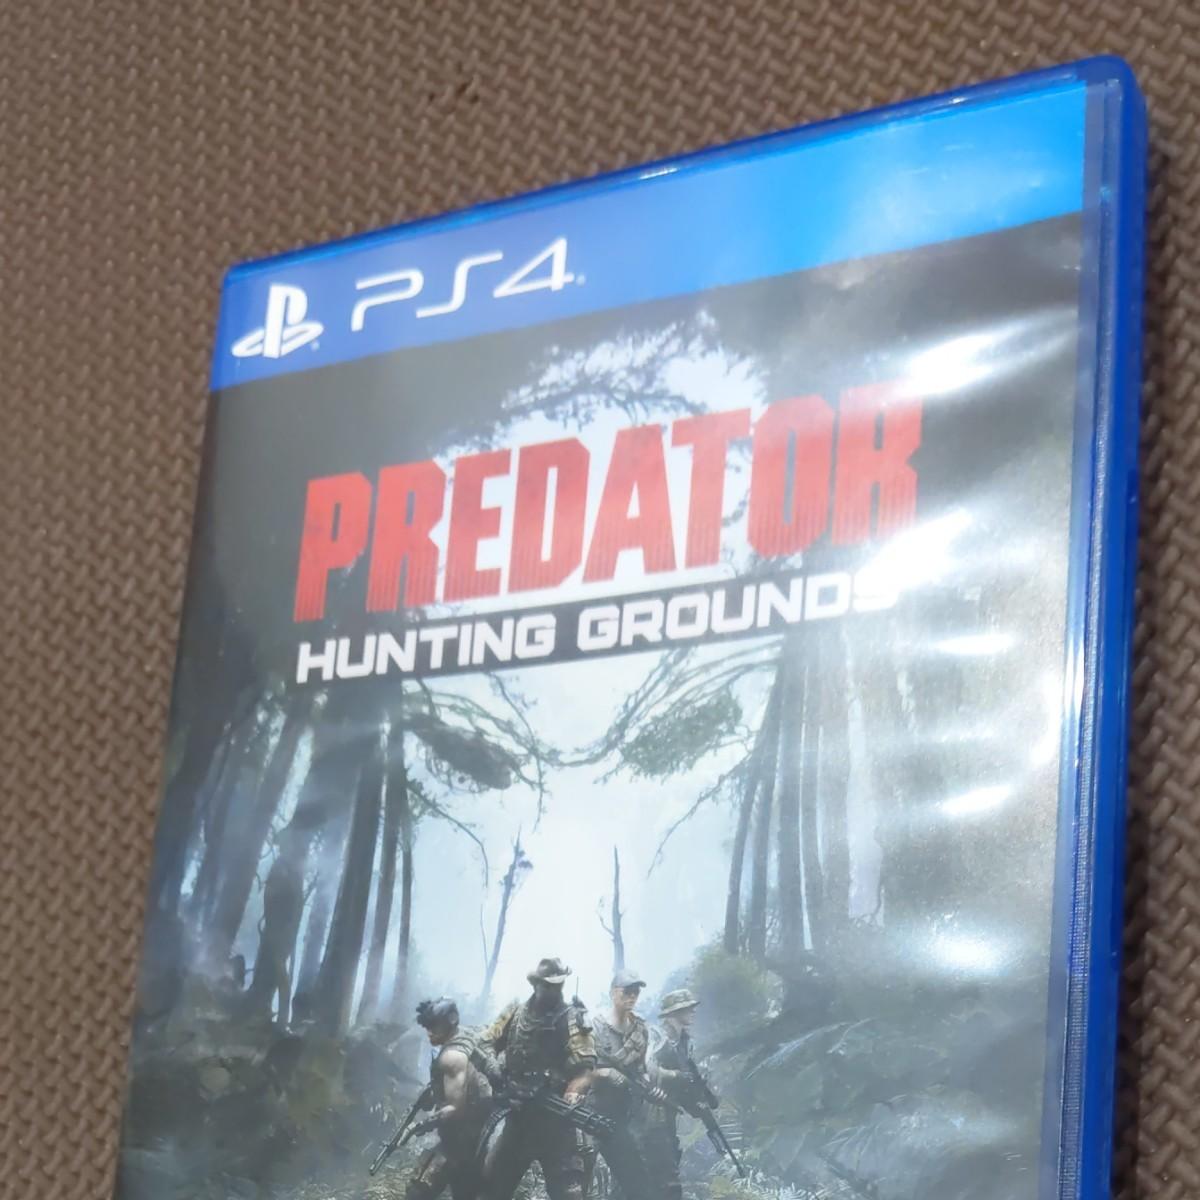 【PS4】 Predator: Hunting Grounds プレデター